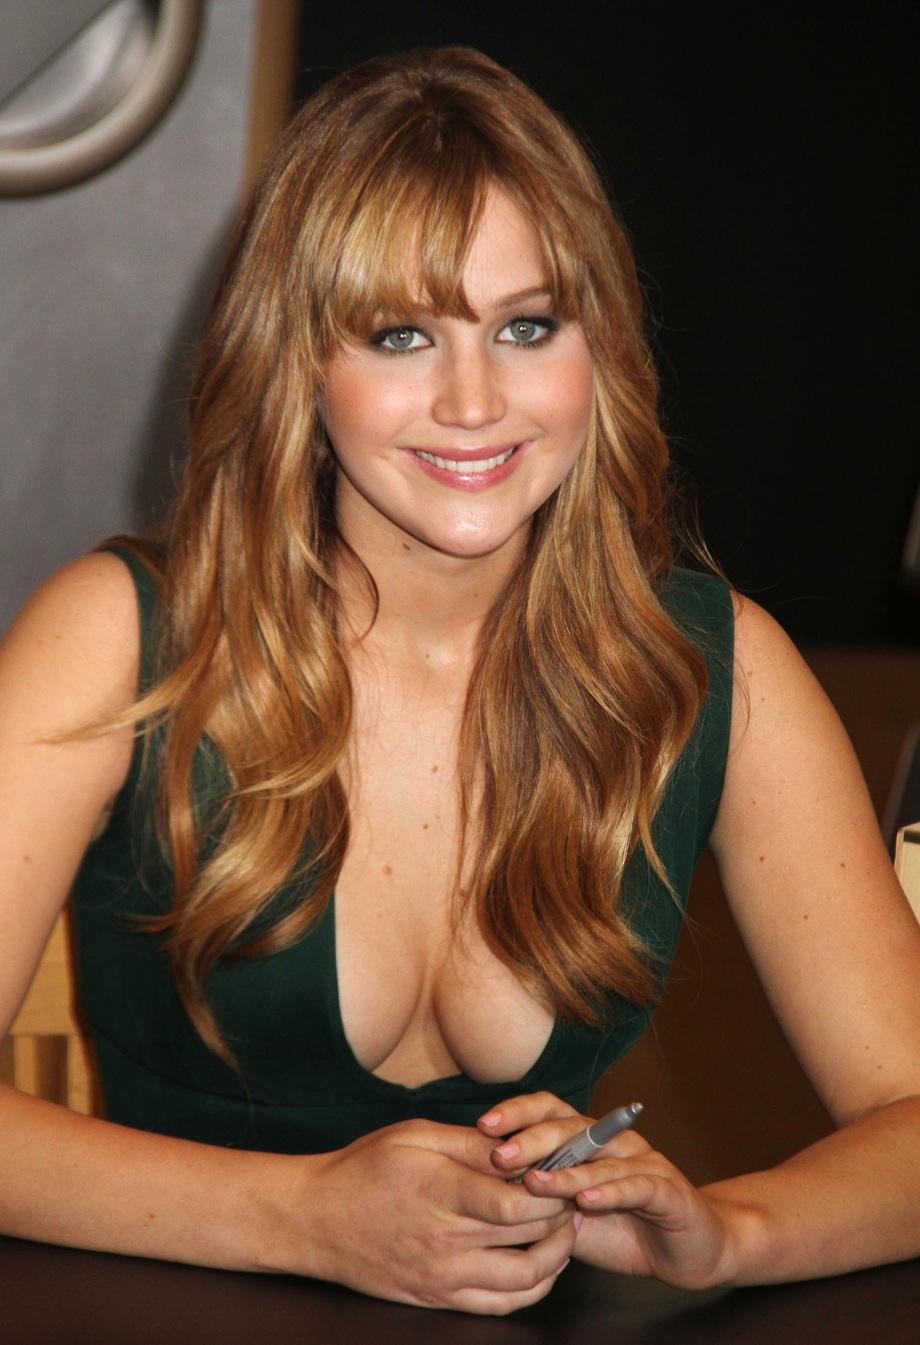 Jennifer Lawrence en robe très décolletée